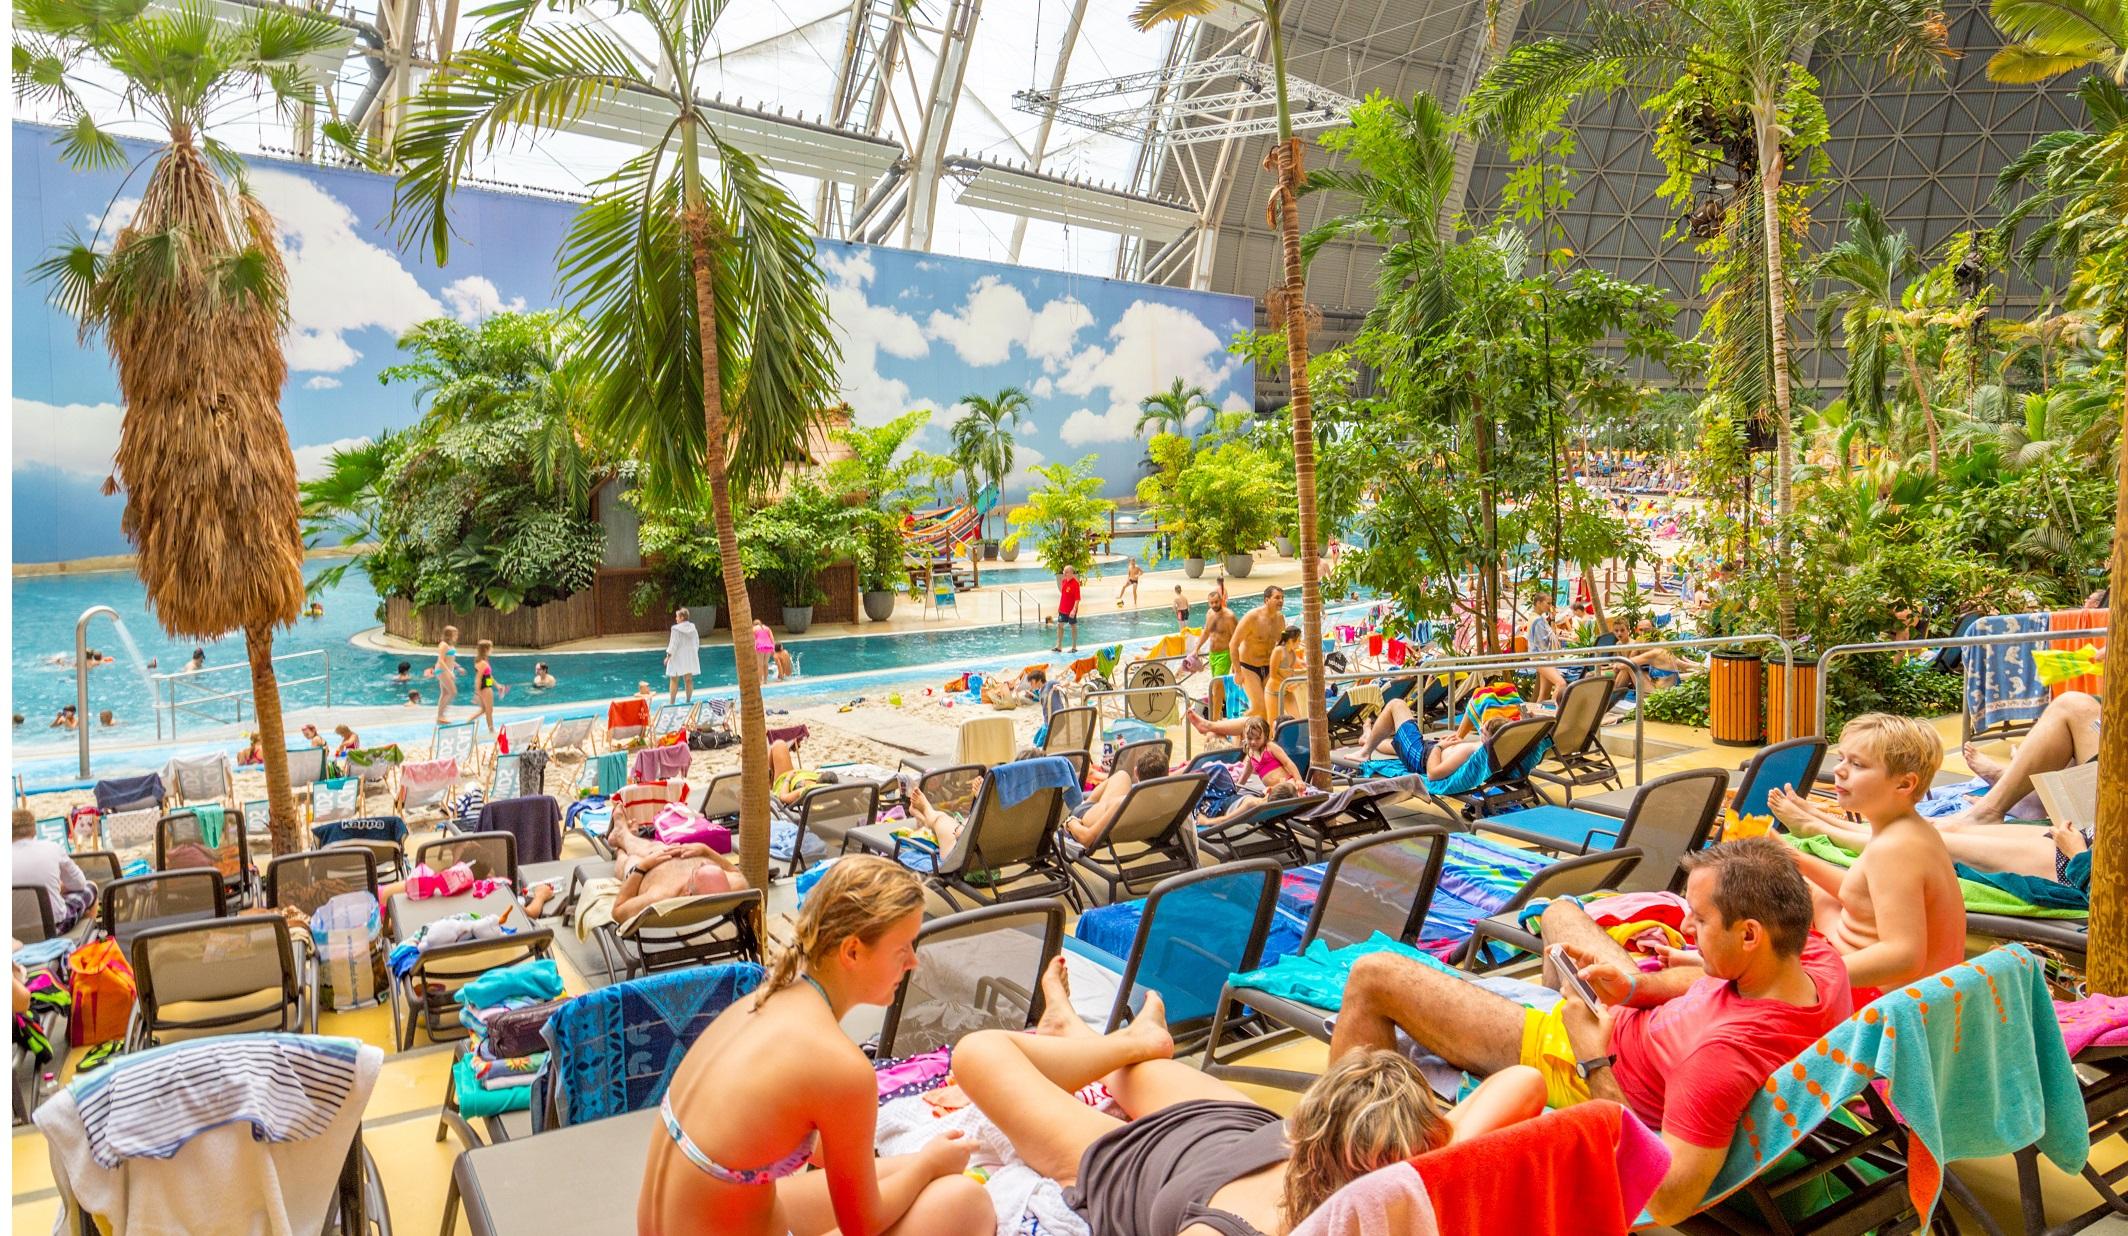 Tropical Island Berlin Program